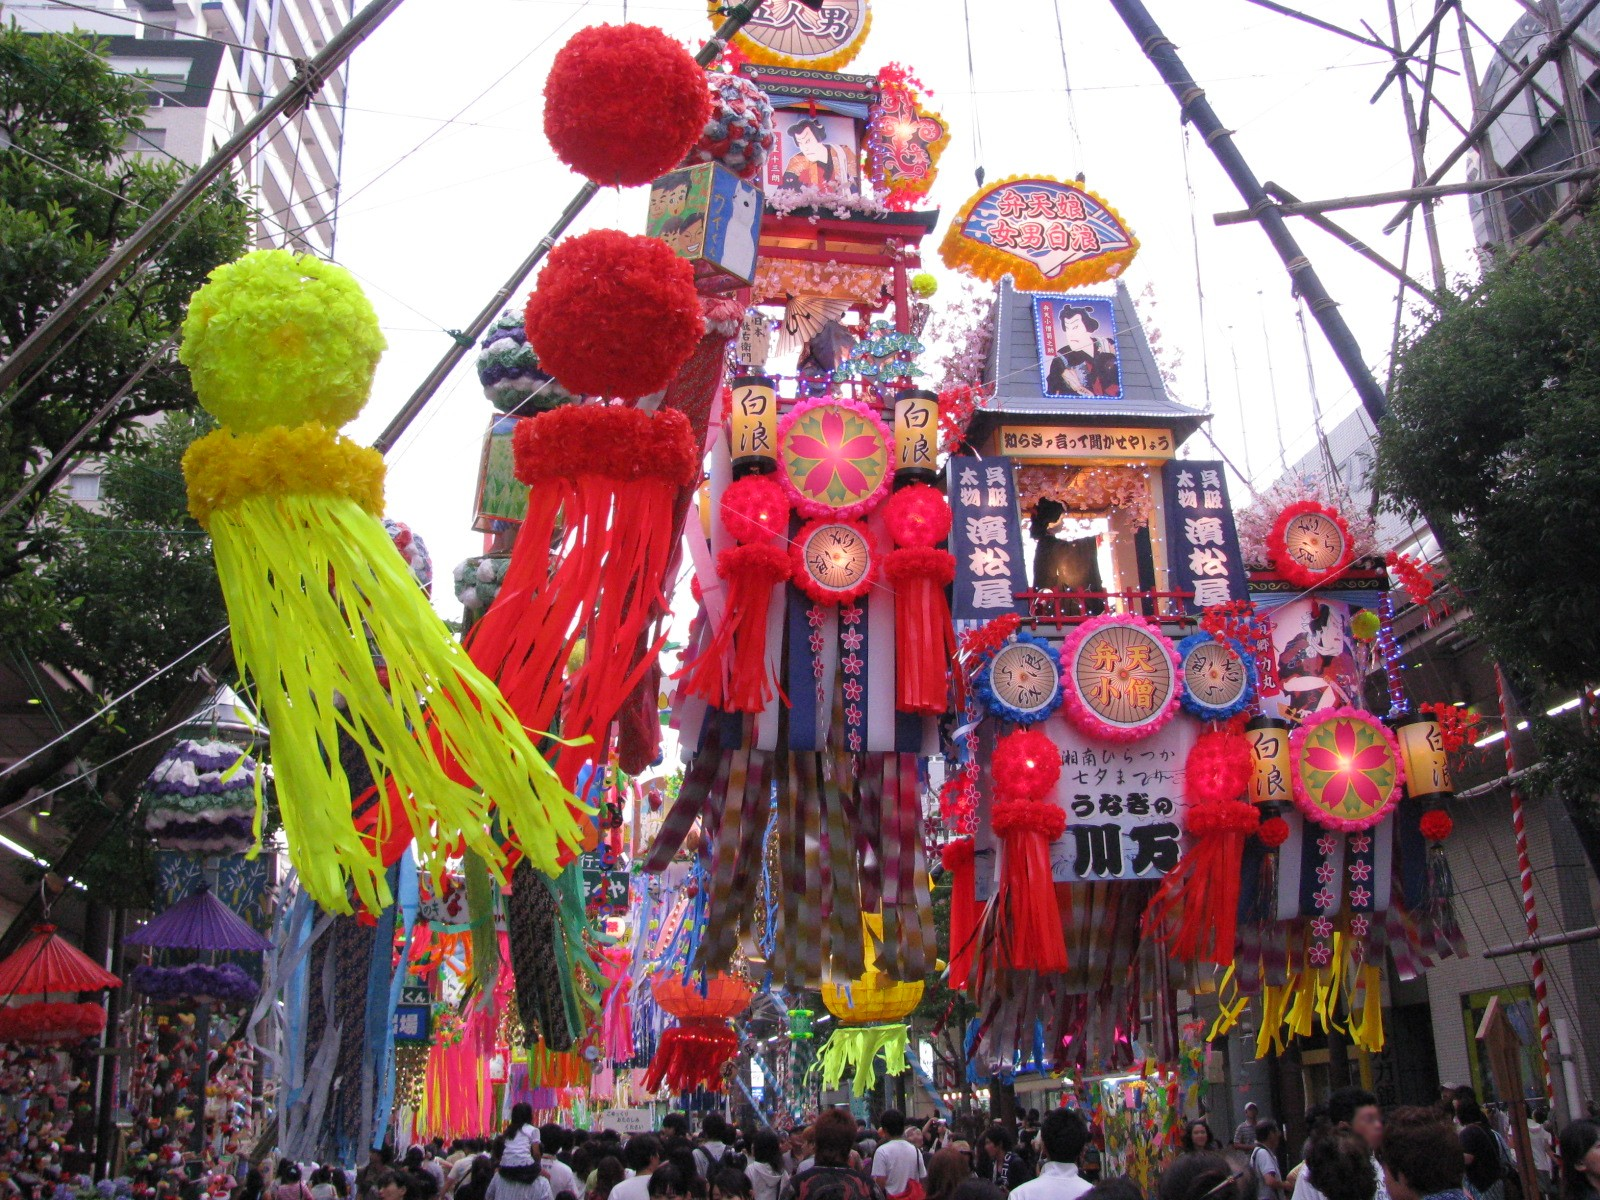 [Mythes] Tanabata - La fête des étoiles Tanabata_festival_in_Hiratsuka_03